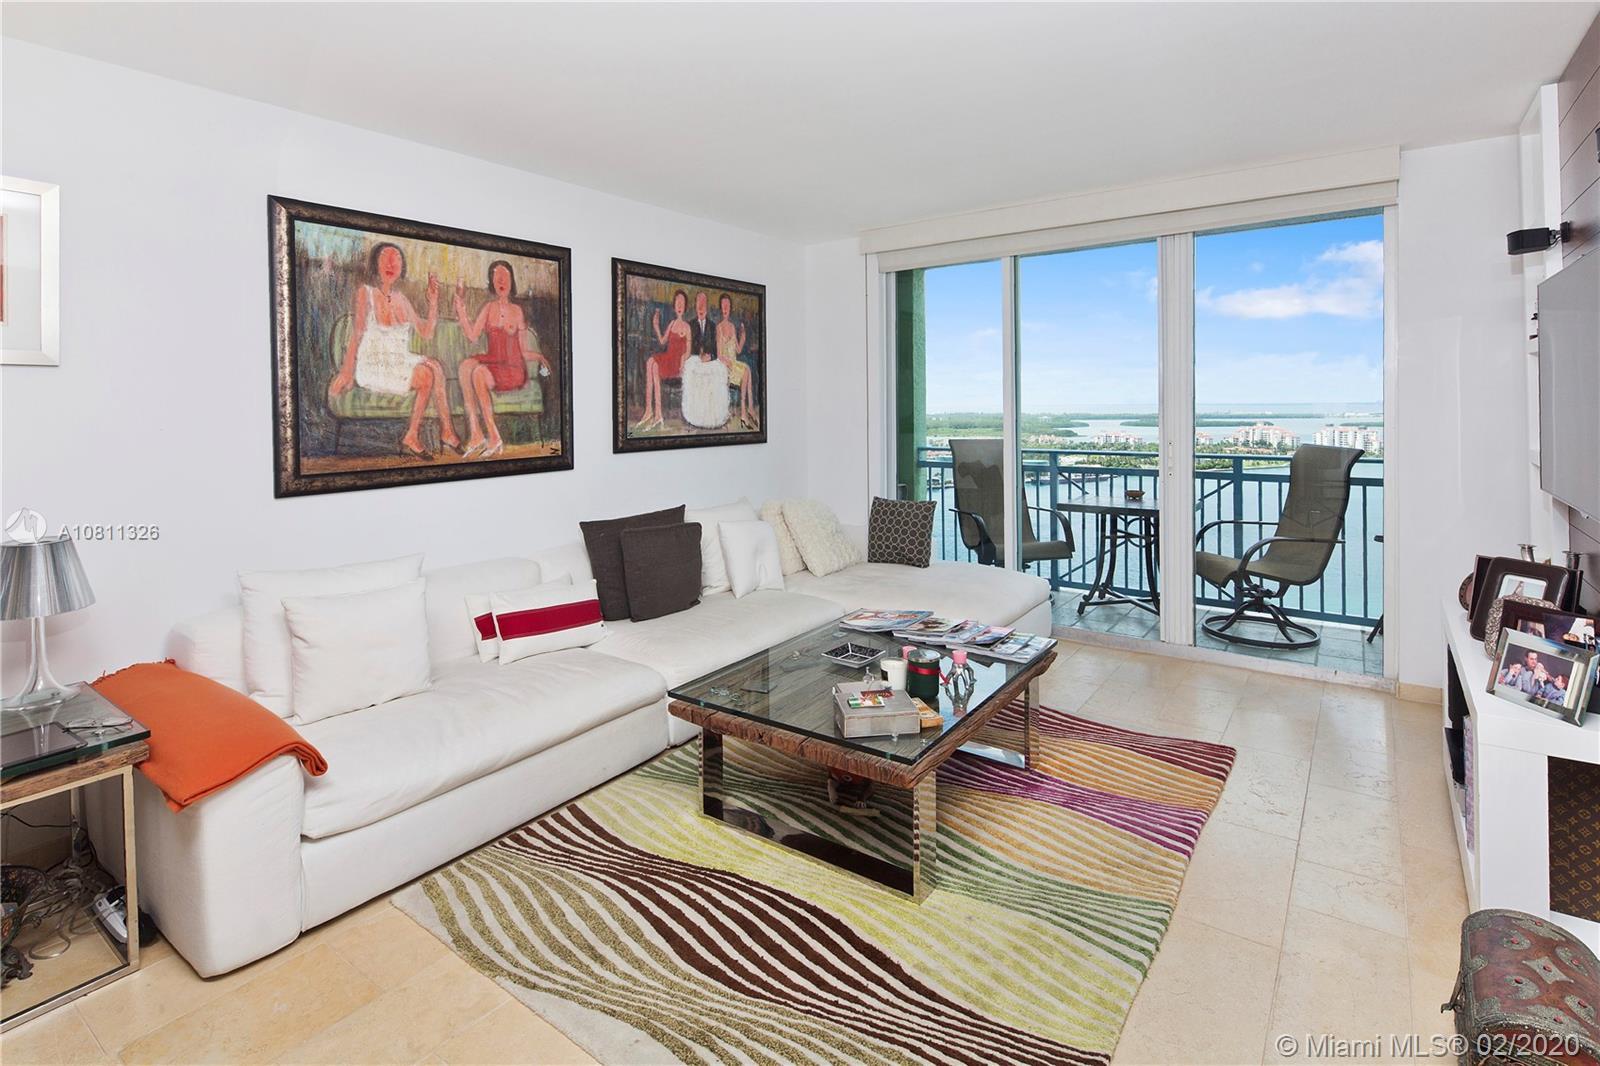 90 ALTON RD, 2906 - Miami Beach, Florida